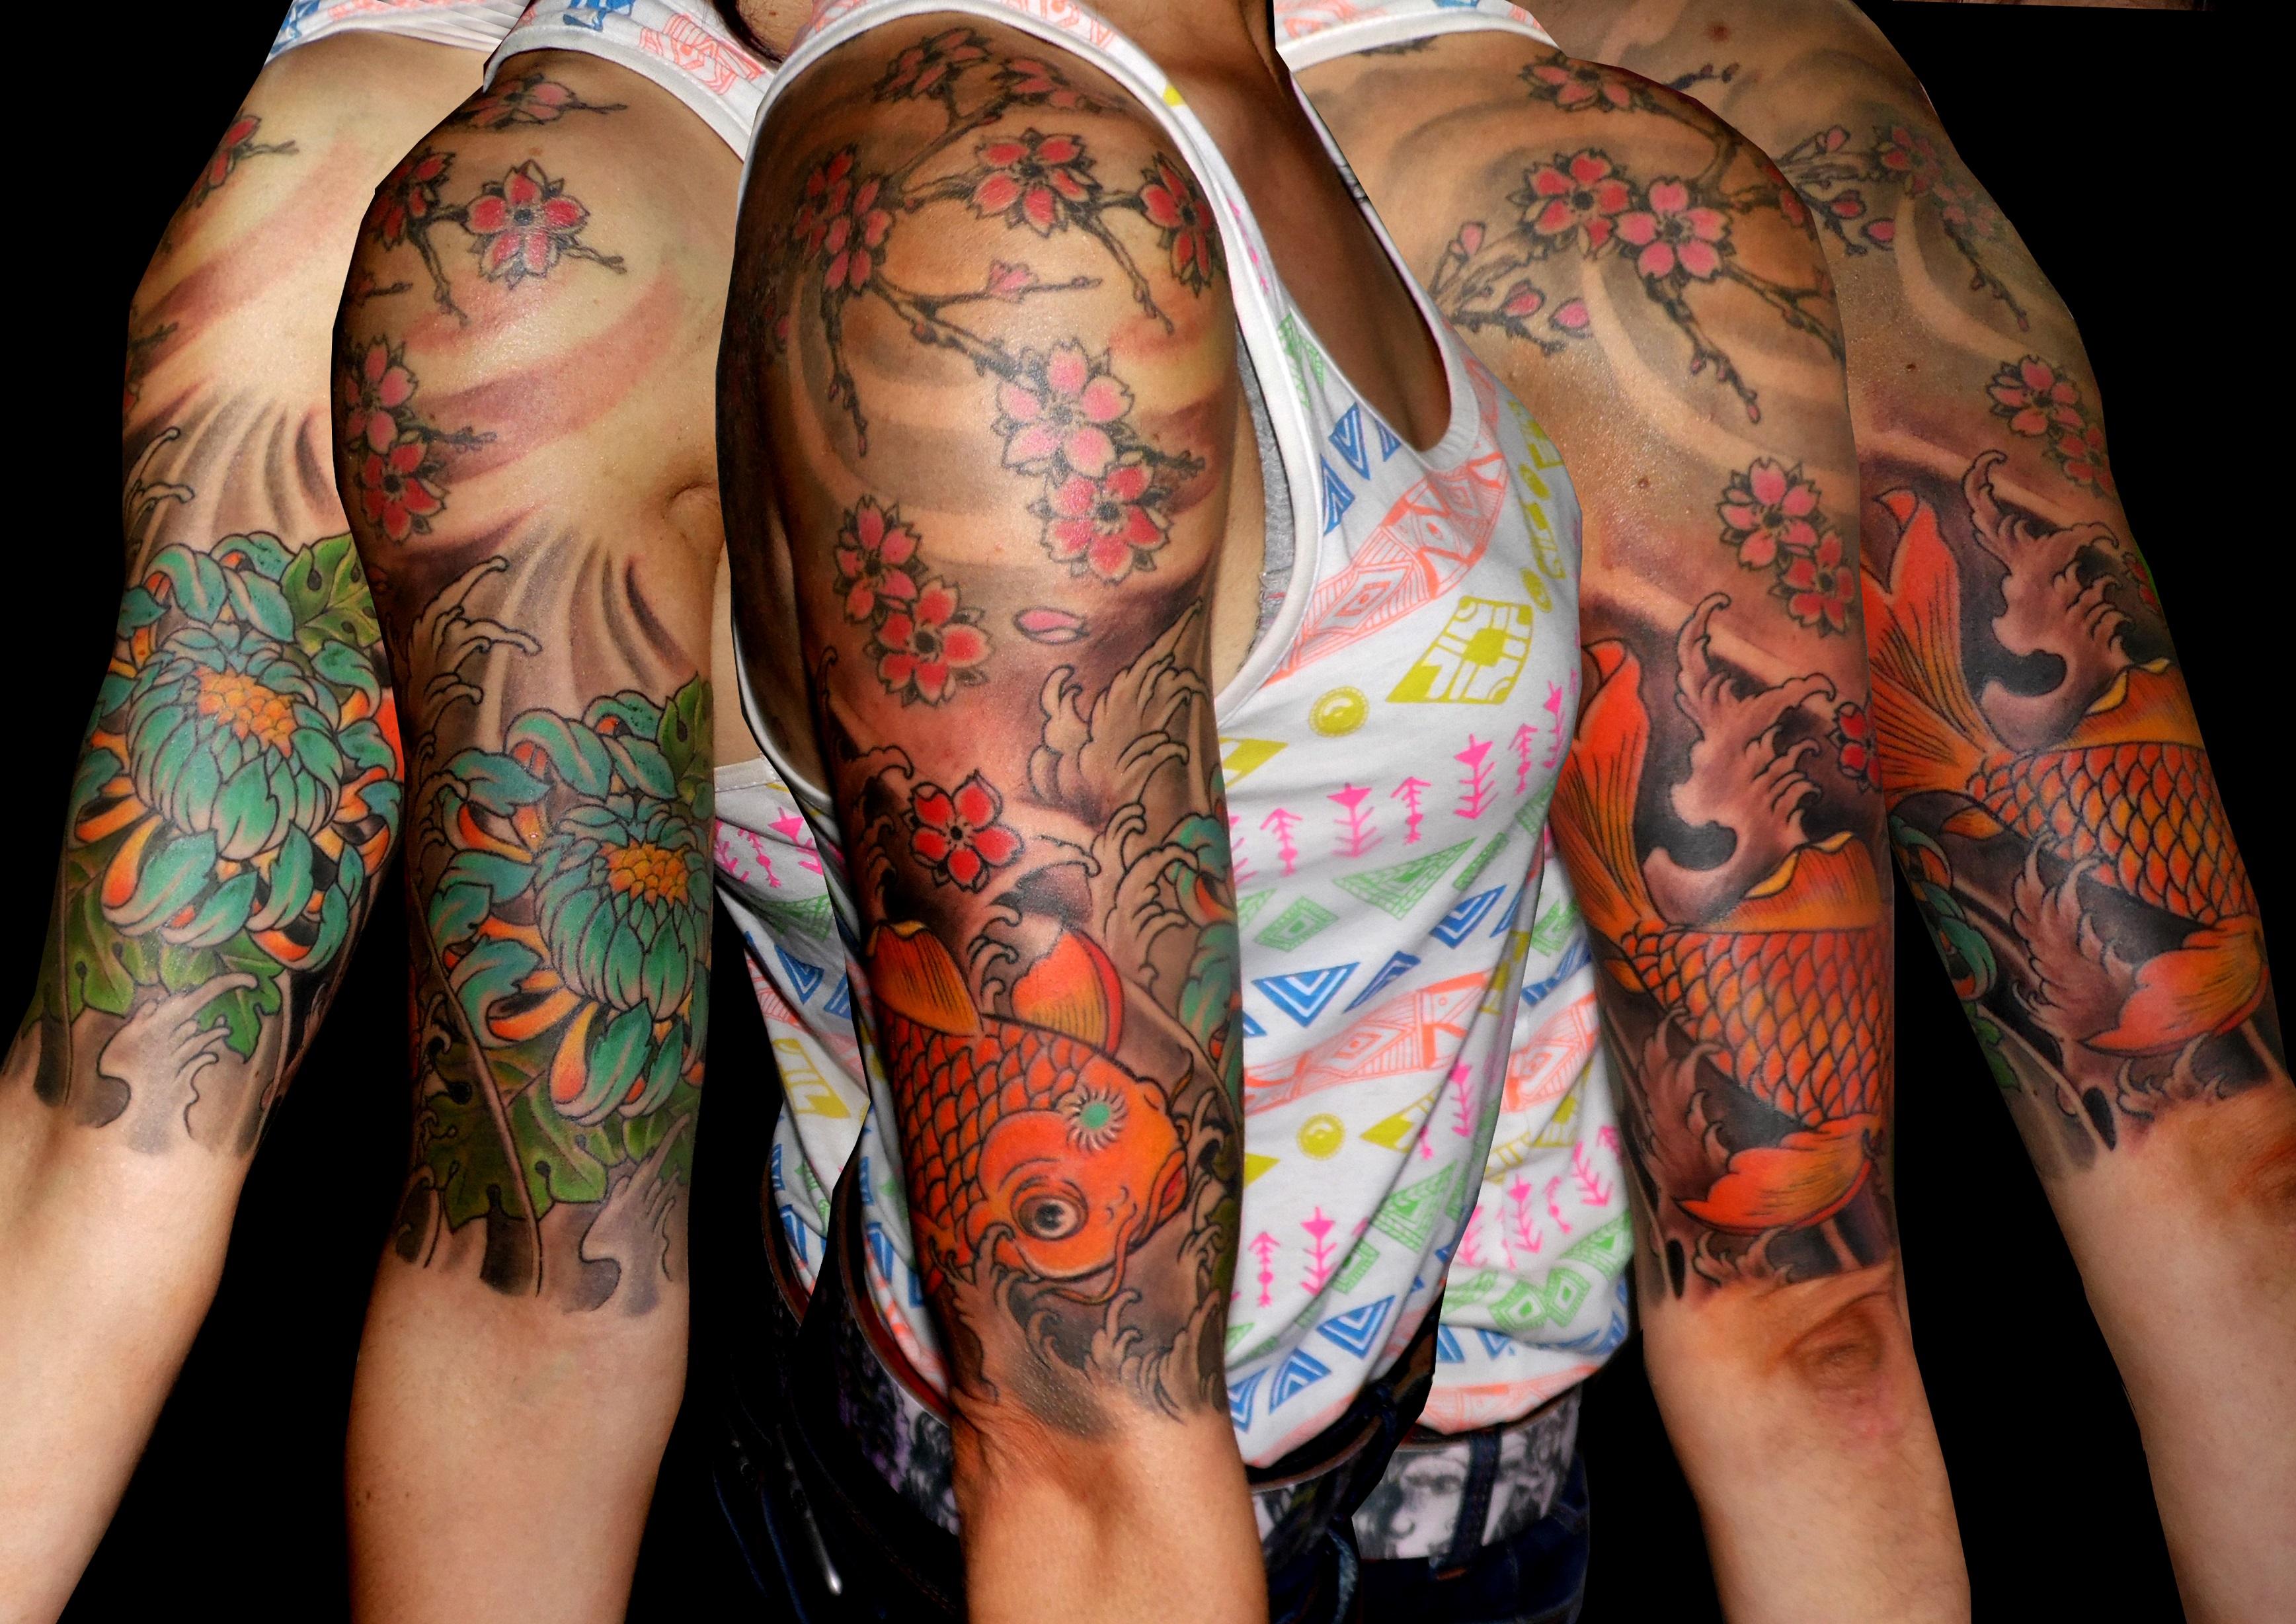 tatuaje tattoo koi japonés crisantemo flores cerezo color brazo hombro chica 13depicas